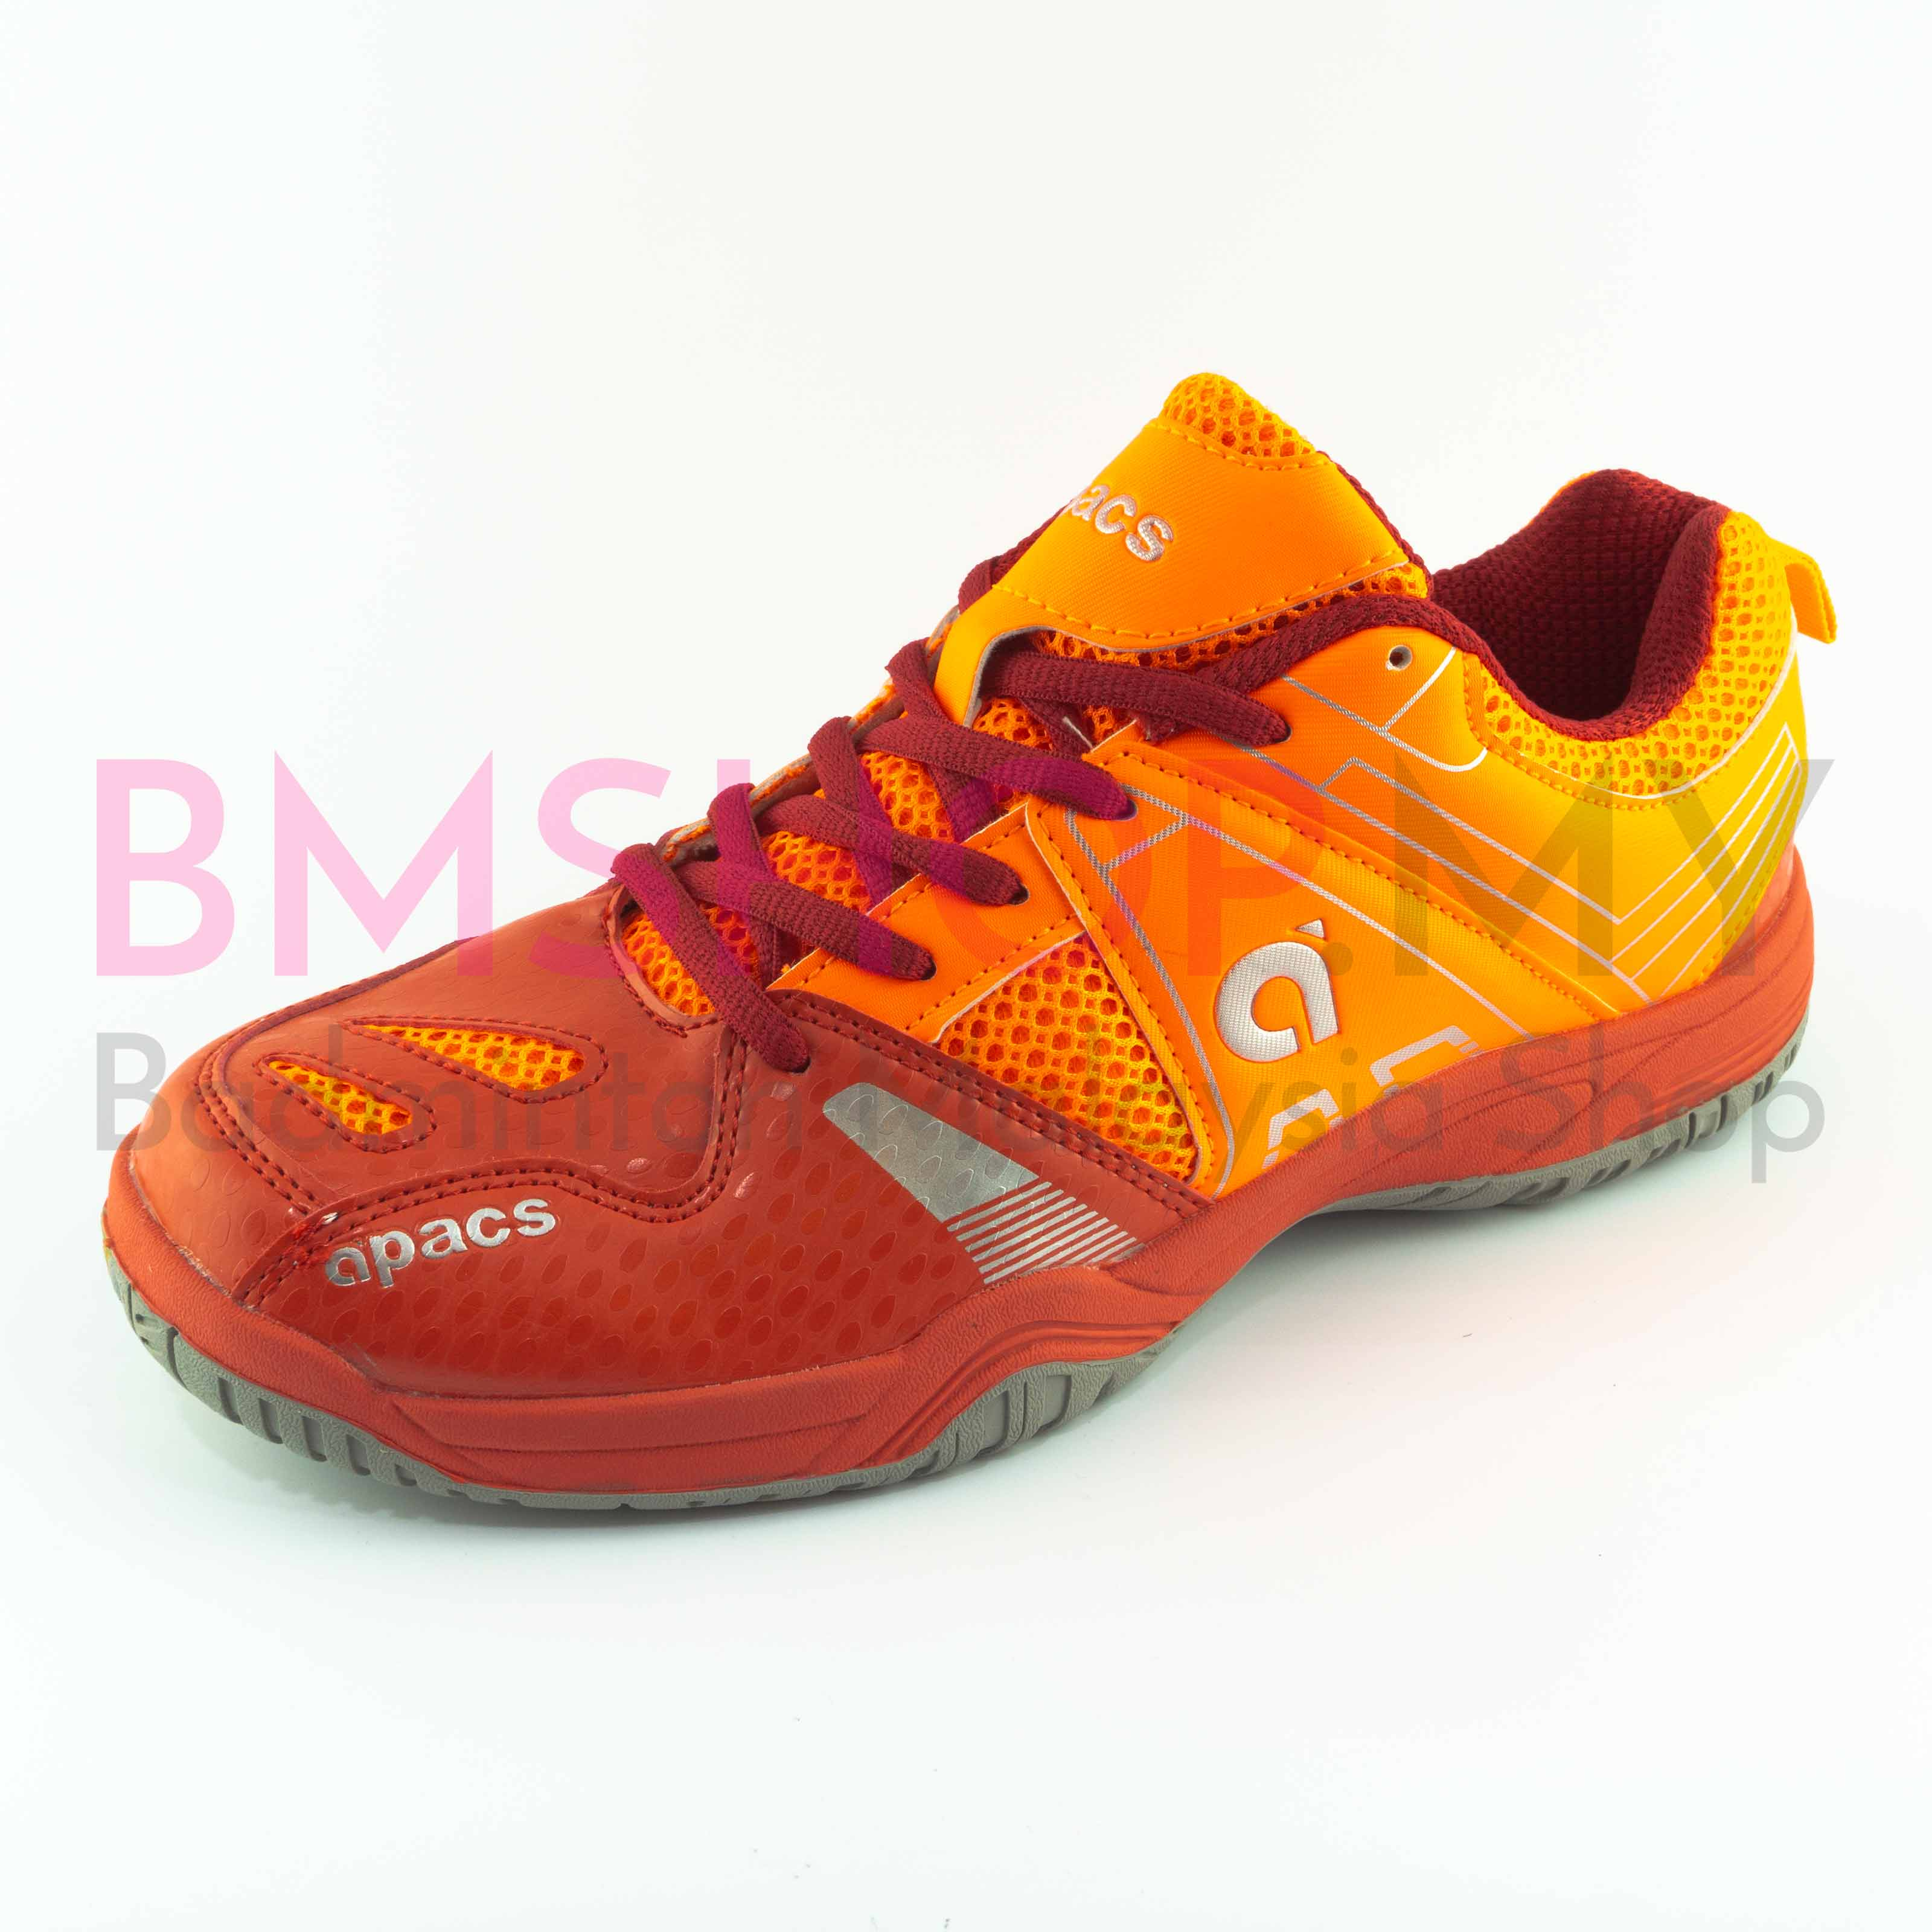 Apacs Shoe Cushion Power 207 Orange/Red